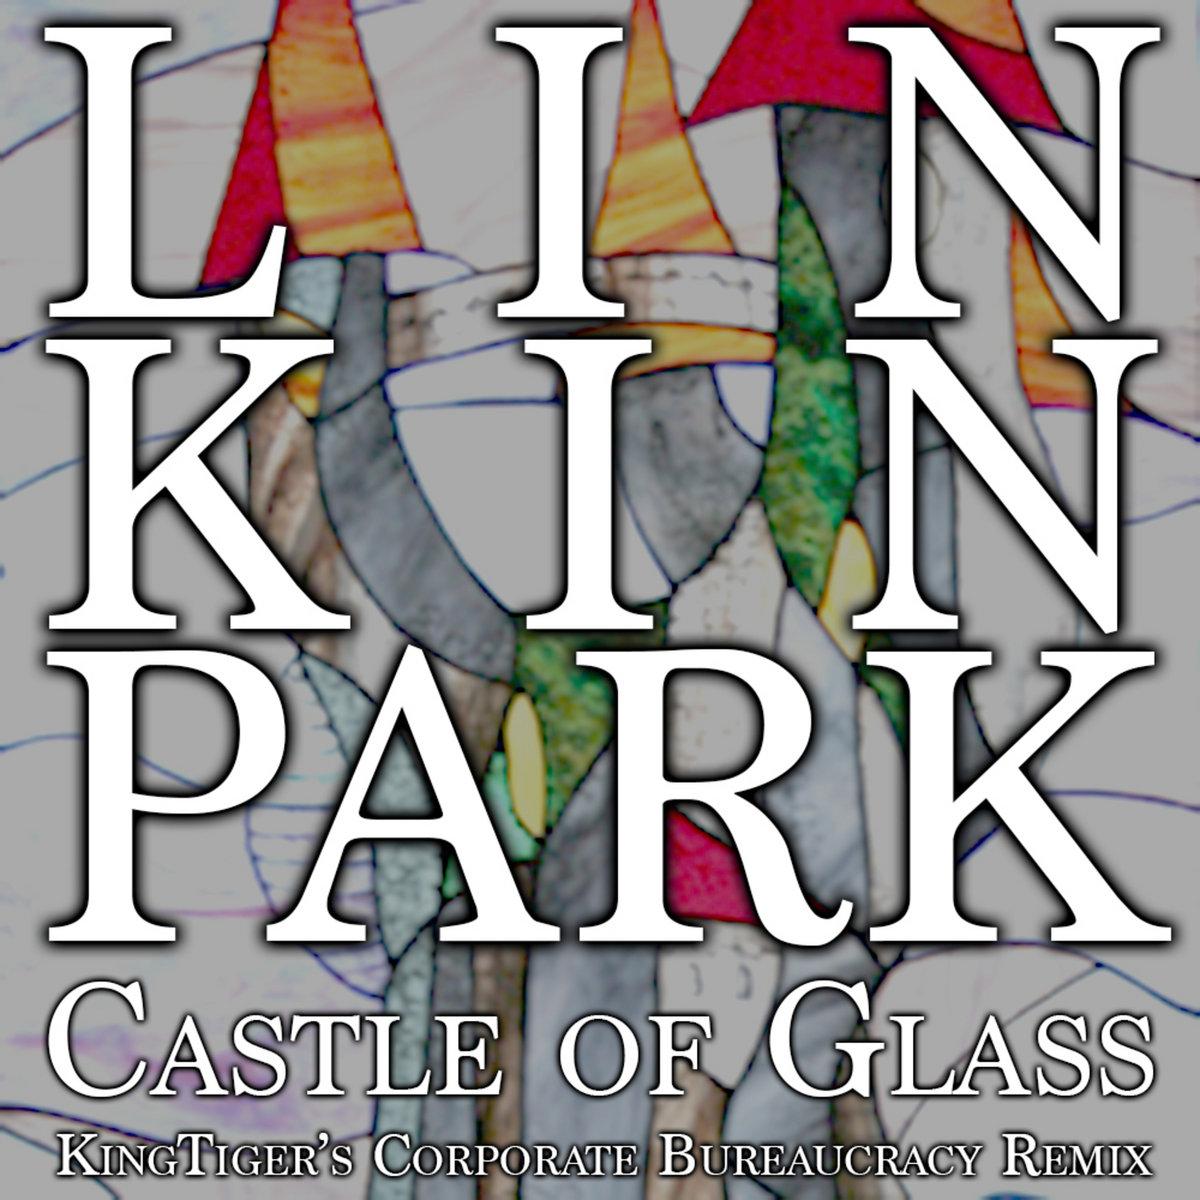 linkin park castle of glass remix mp3 download